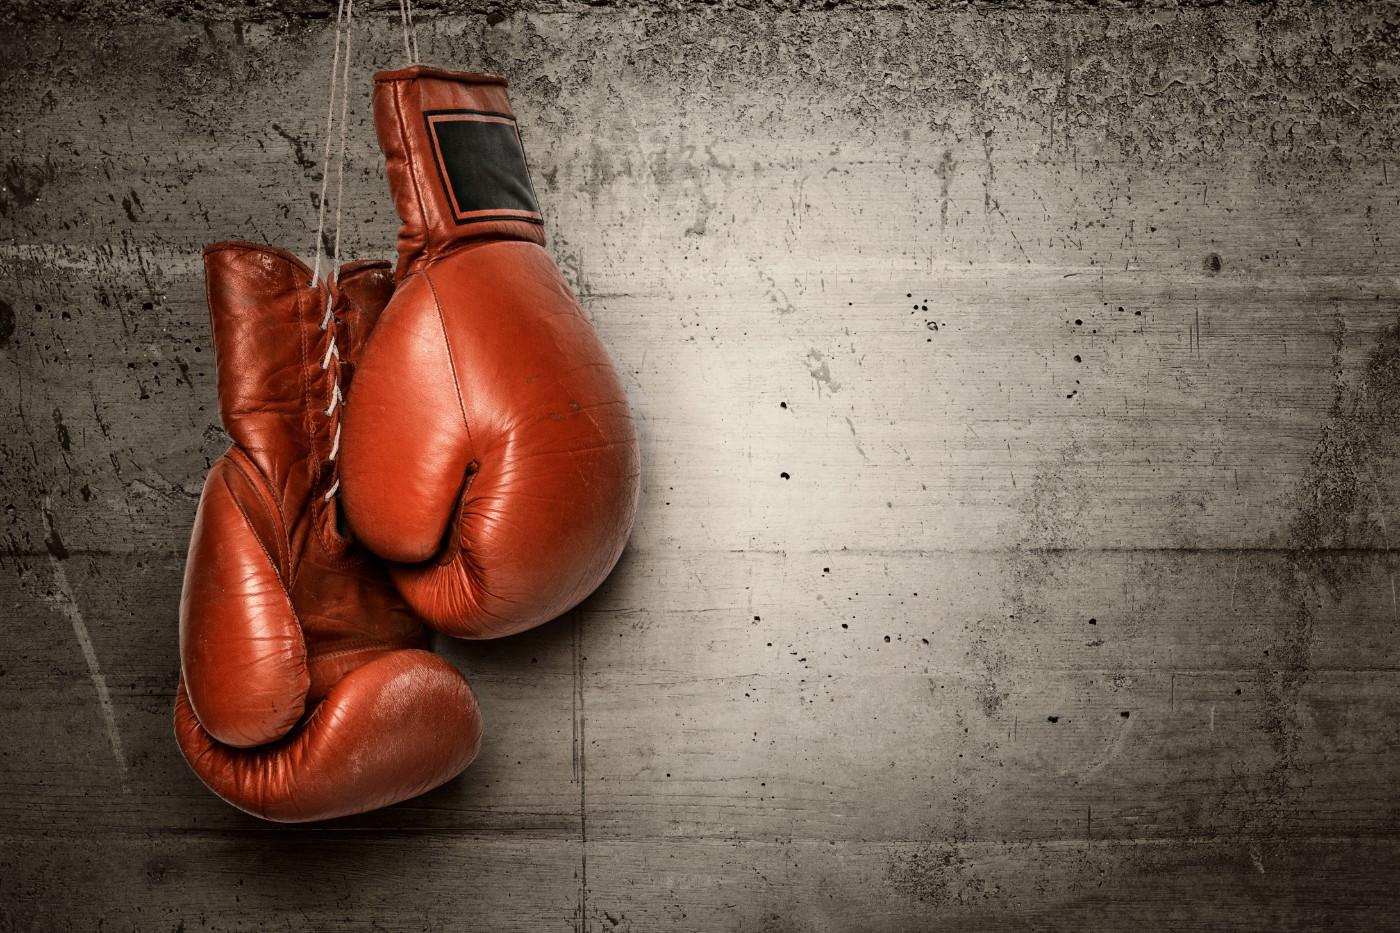 https://tickertapecdn.tdameritrade.com/assets/images/pages/md/Boxing gloves: index funds vs. mutual funds; active management vs. passive management for investors